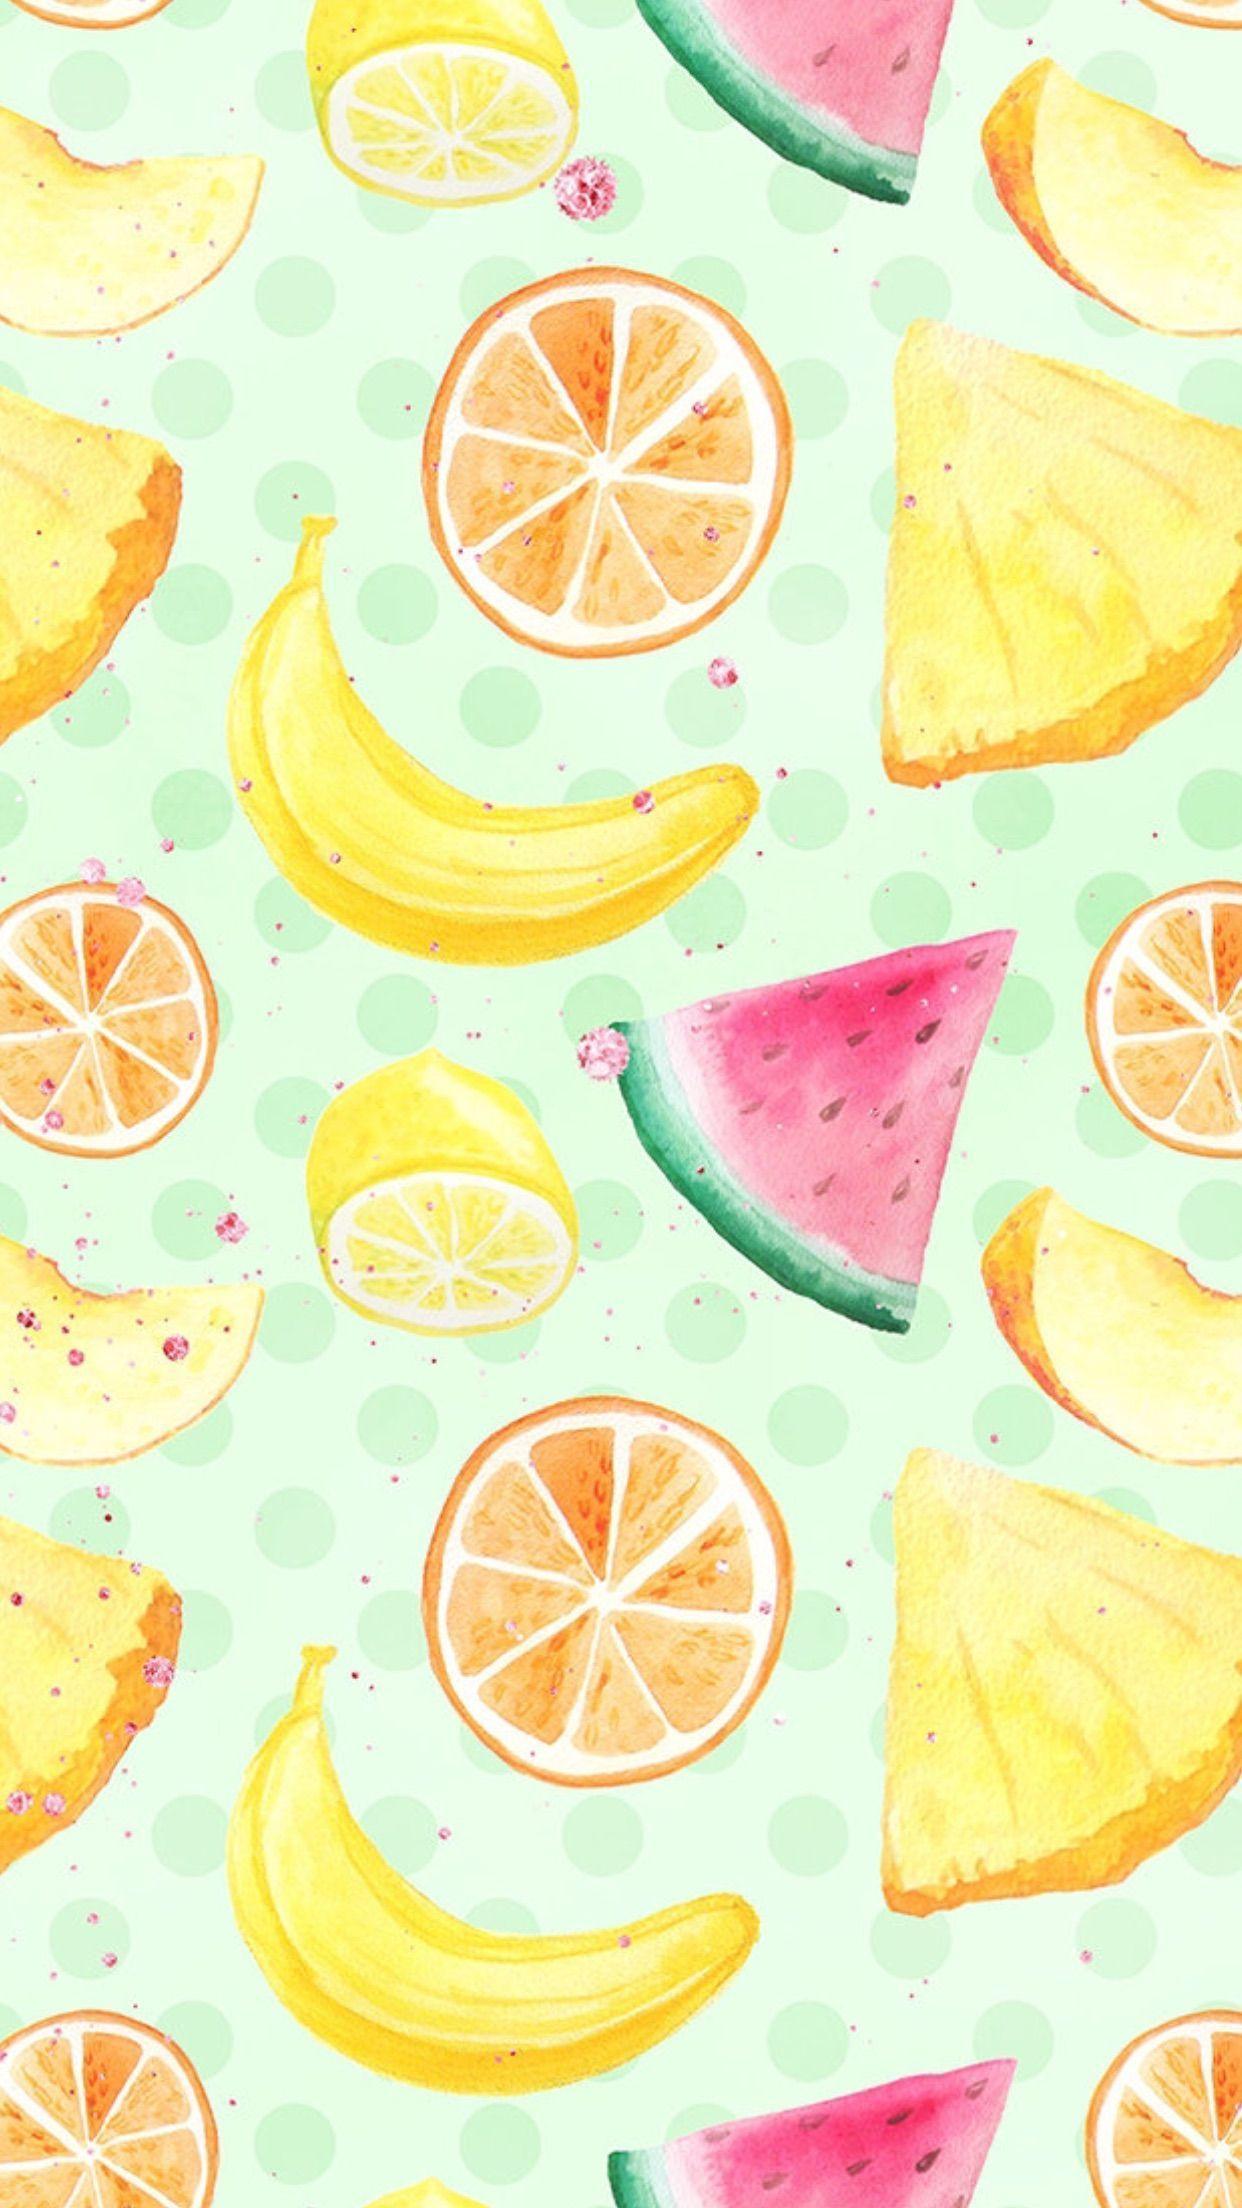 "cute food iphone wallpapers top free cute food iphone backgrounds1080x1920 59 cute food wallpapers on wallpaperplay\""\u003e"